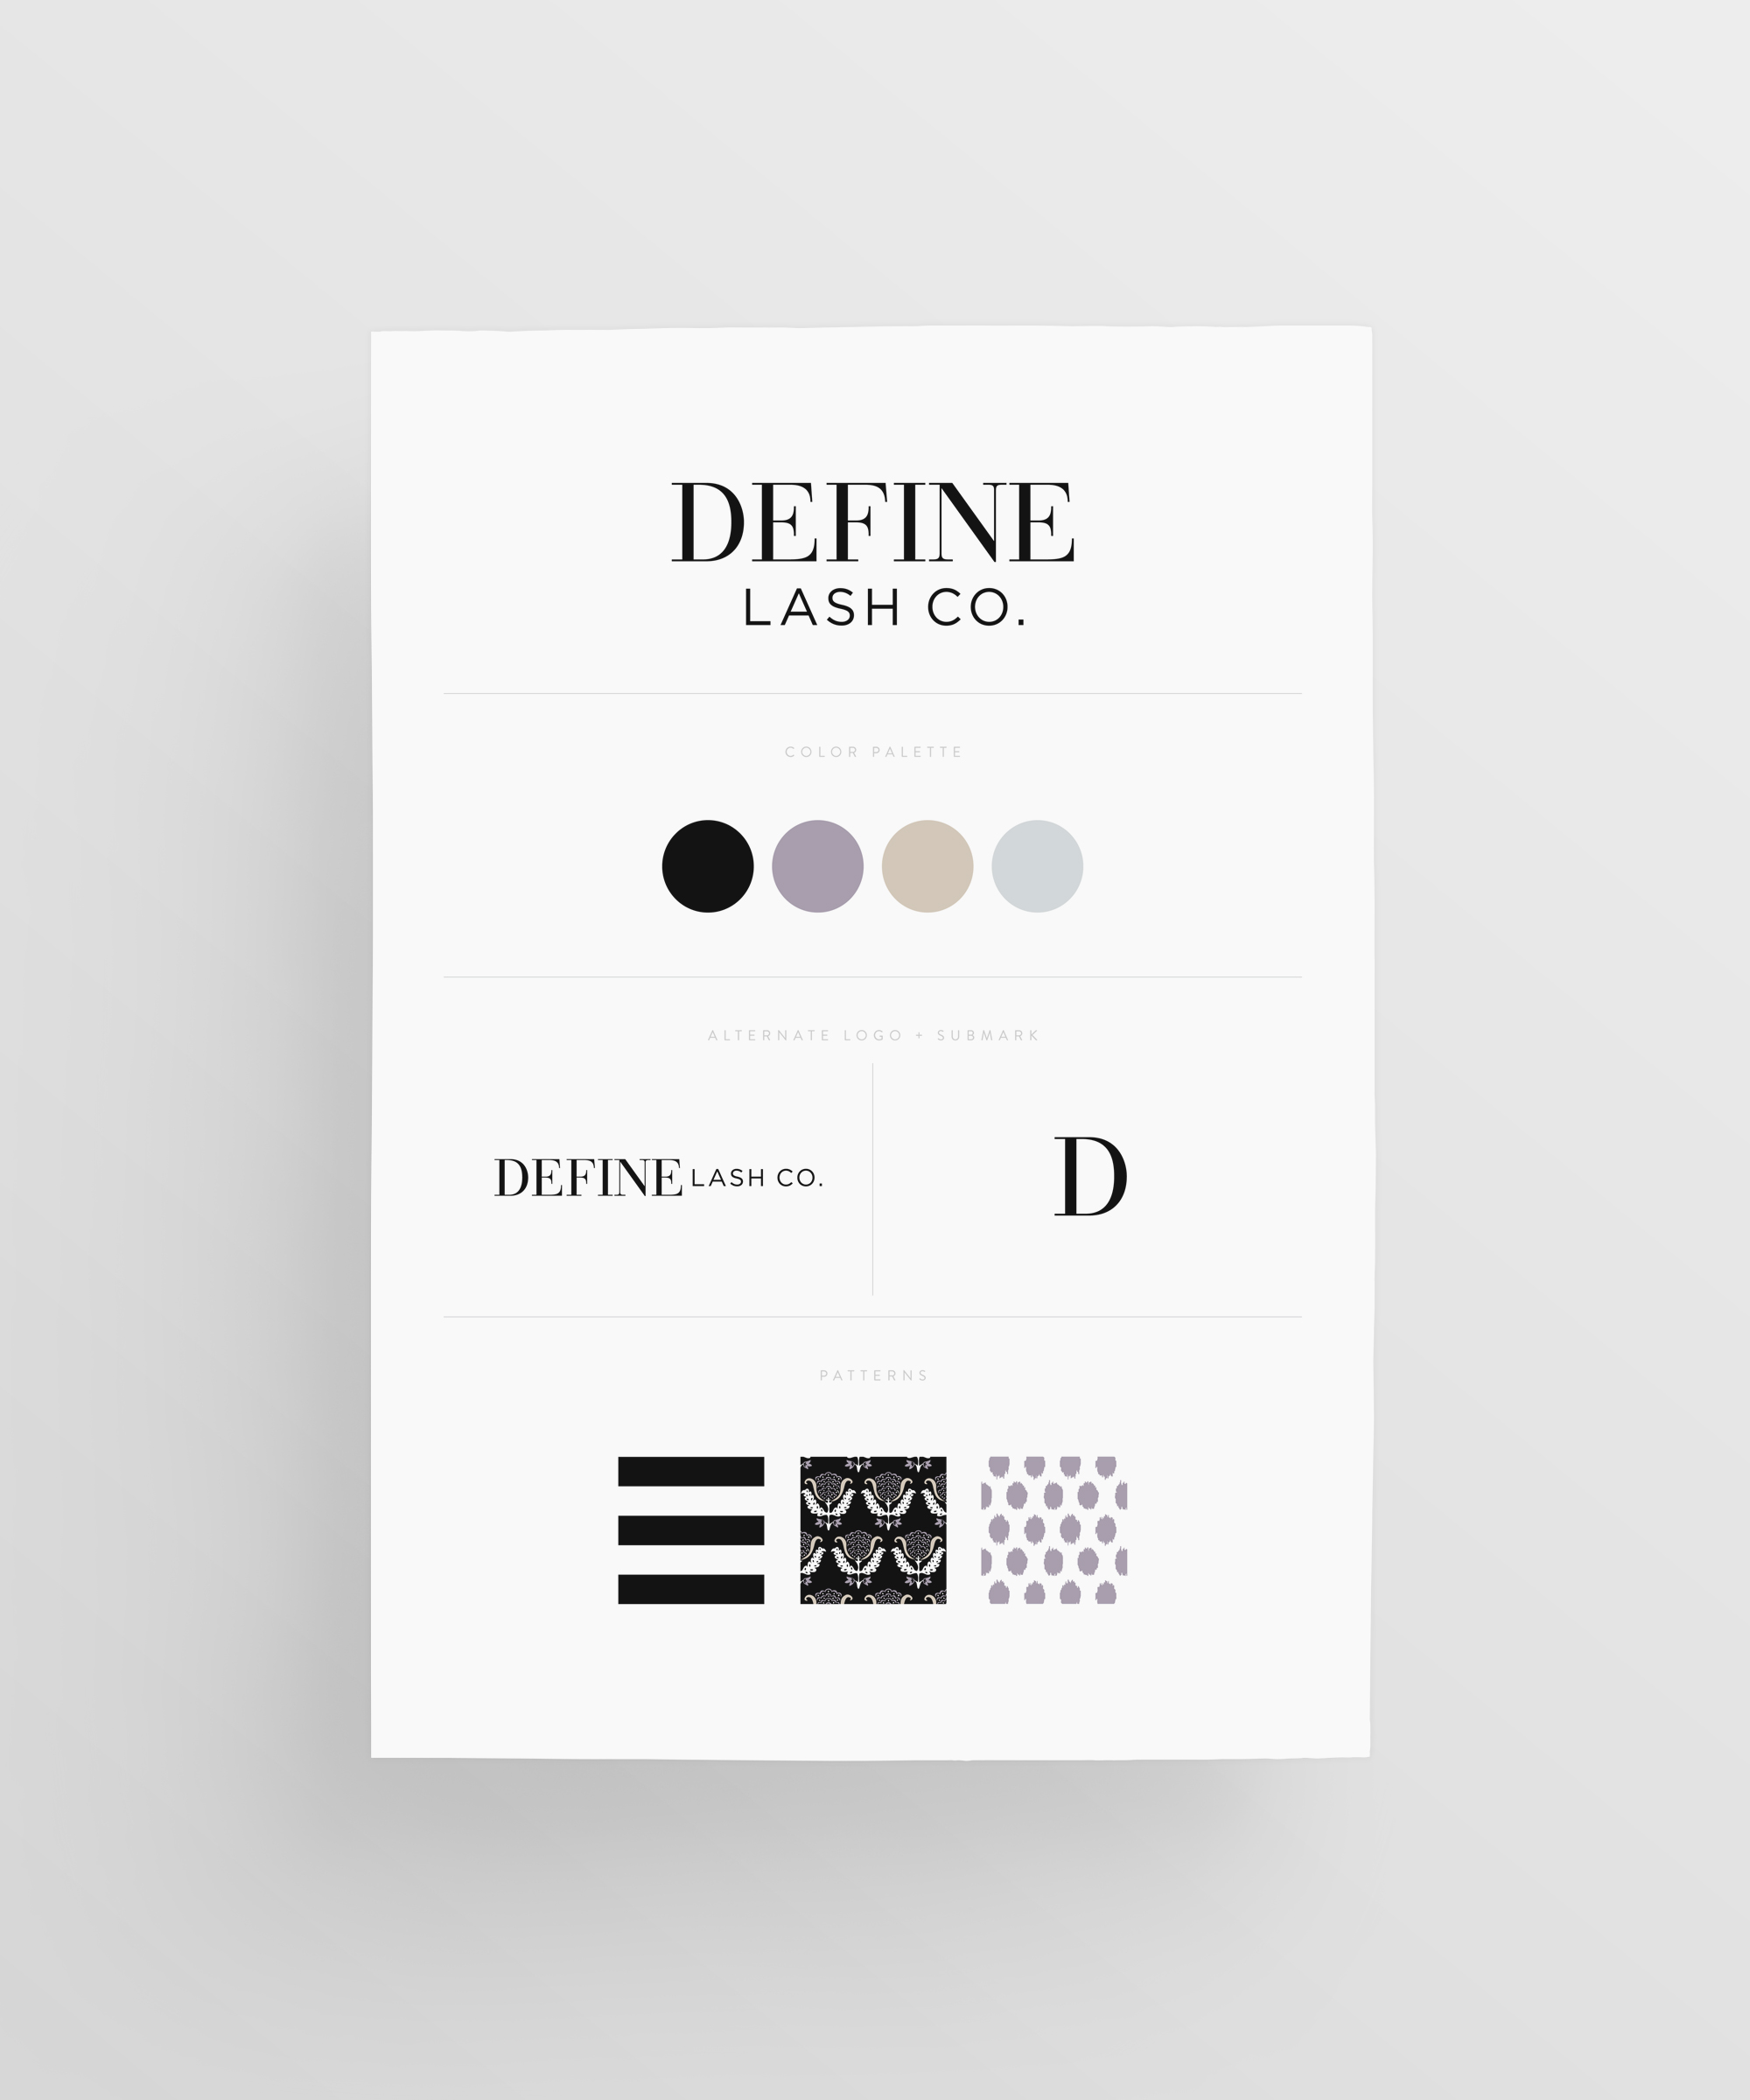 brand-style-guide-portfolio-dlc.jpg